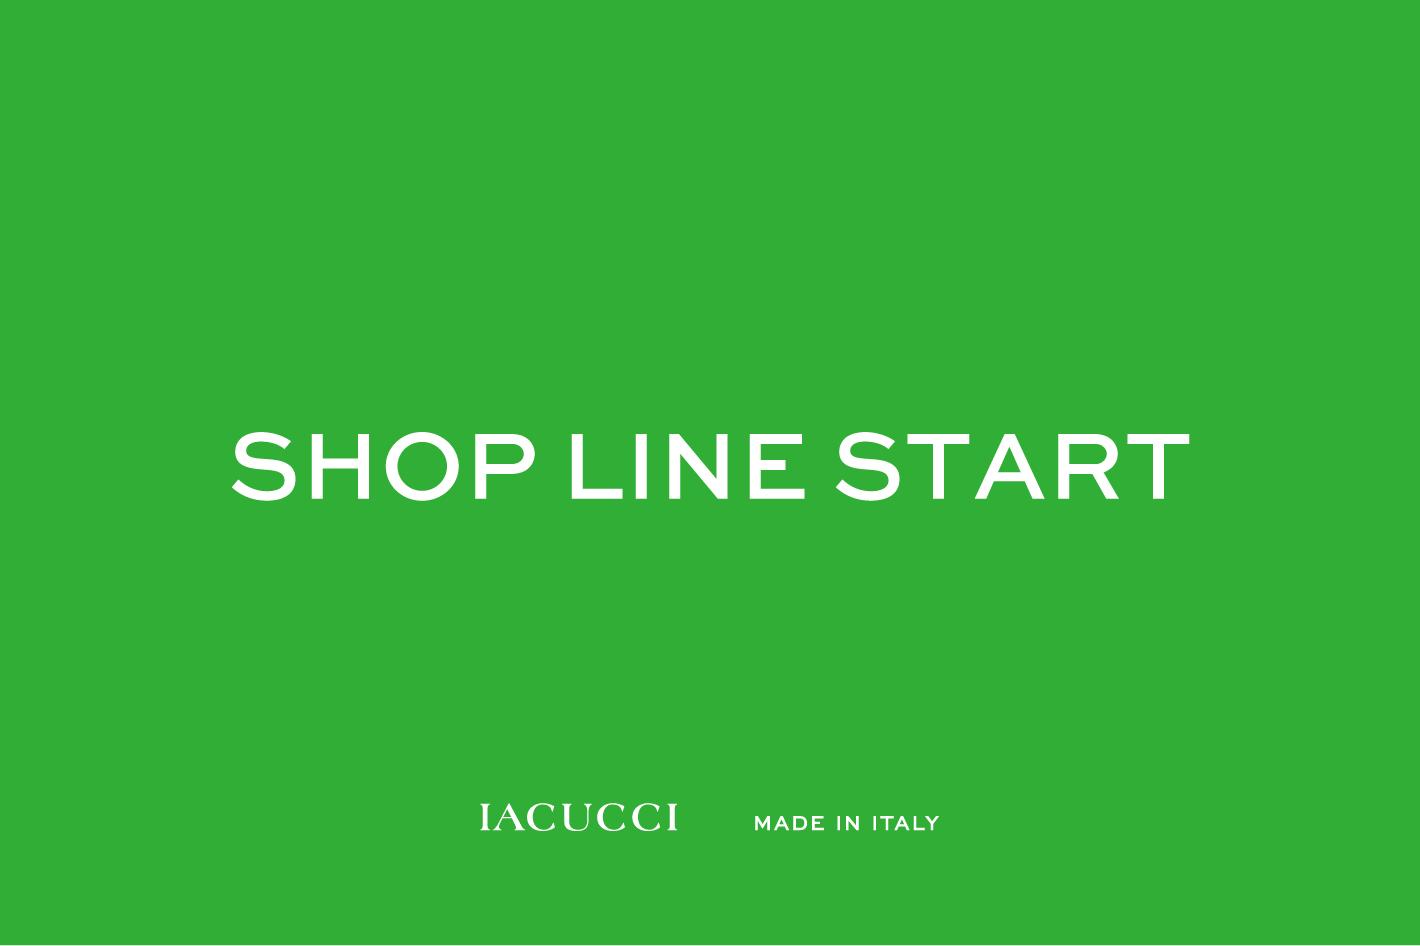 IACUCCI IACUCCI店舗公式LINEがスタート!